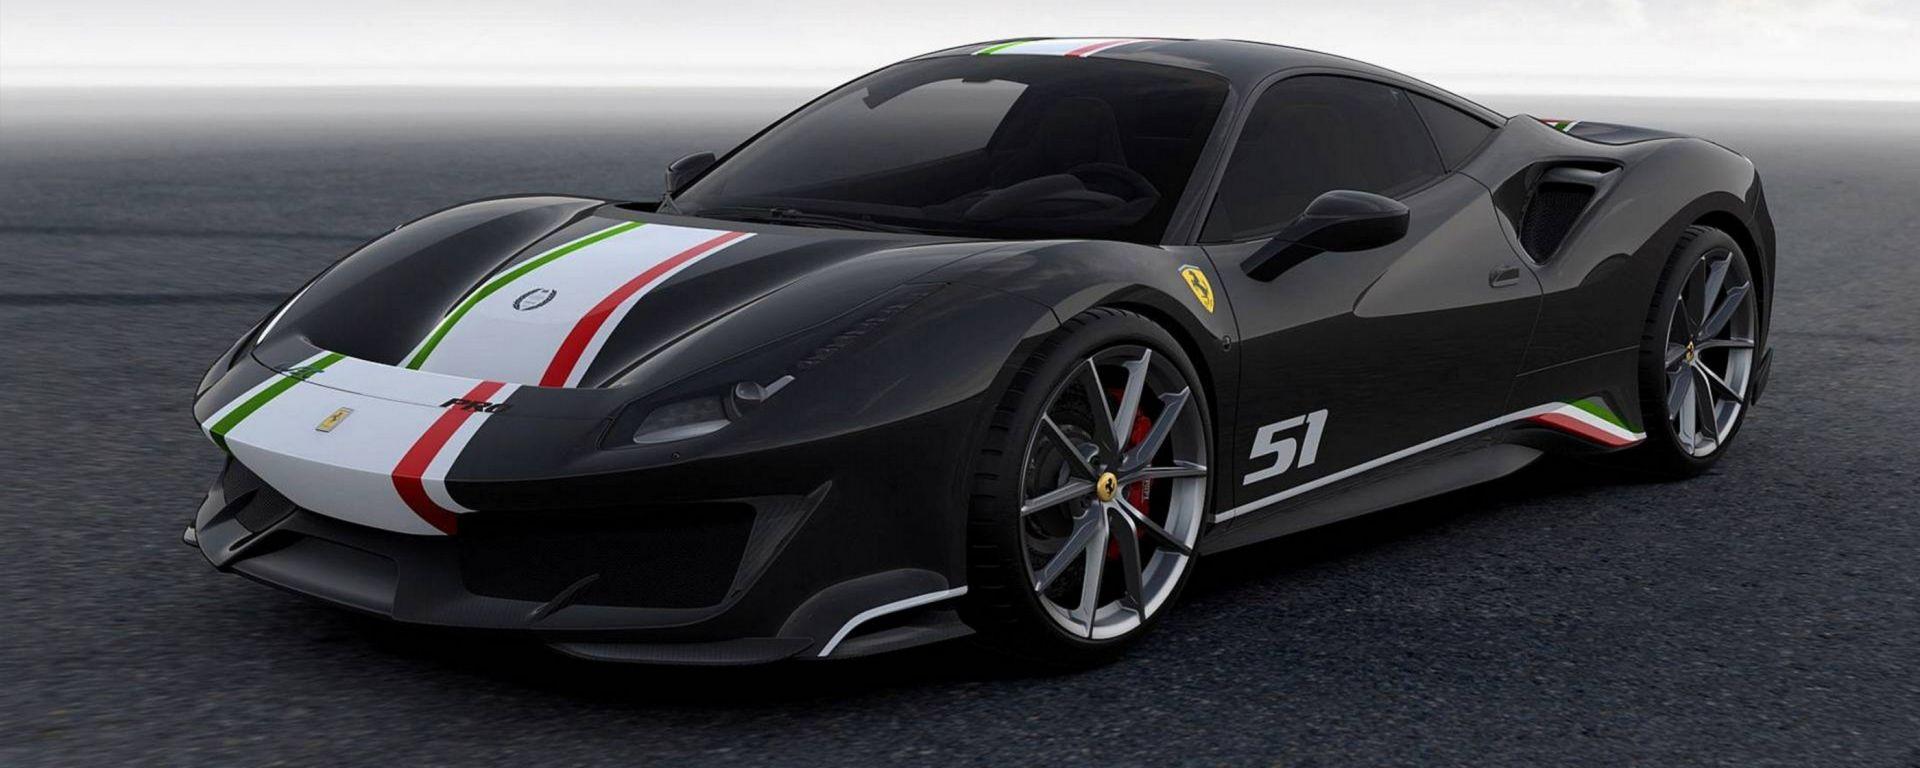 Ferrari 488 Pista vs McLaren 720S: ecco chi vince